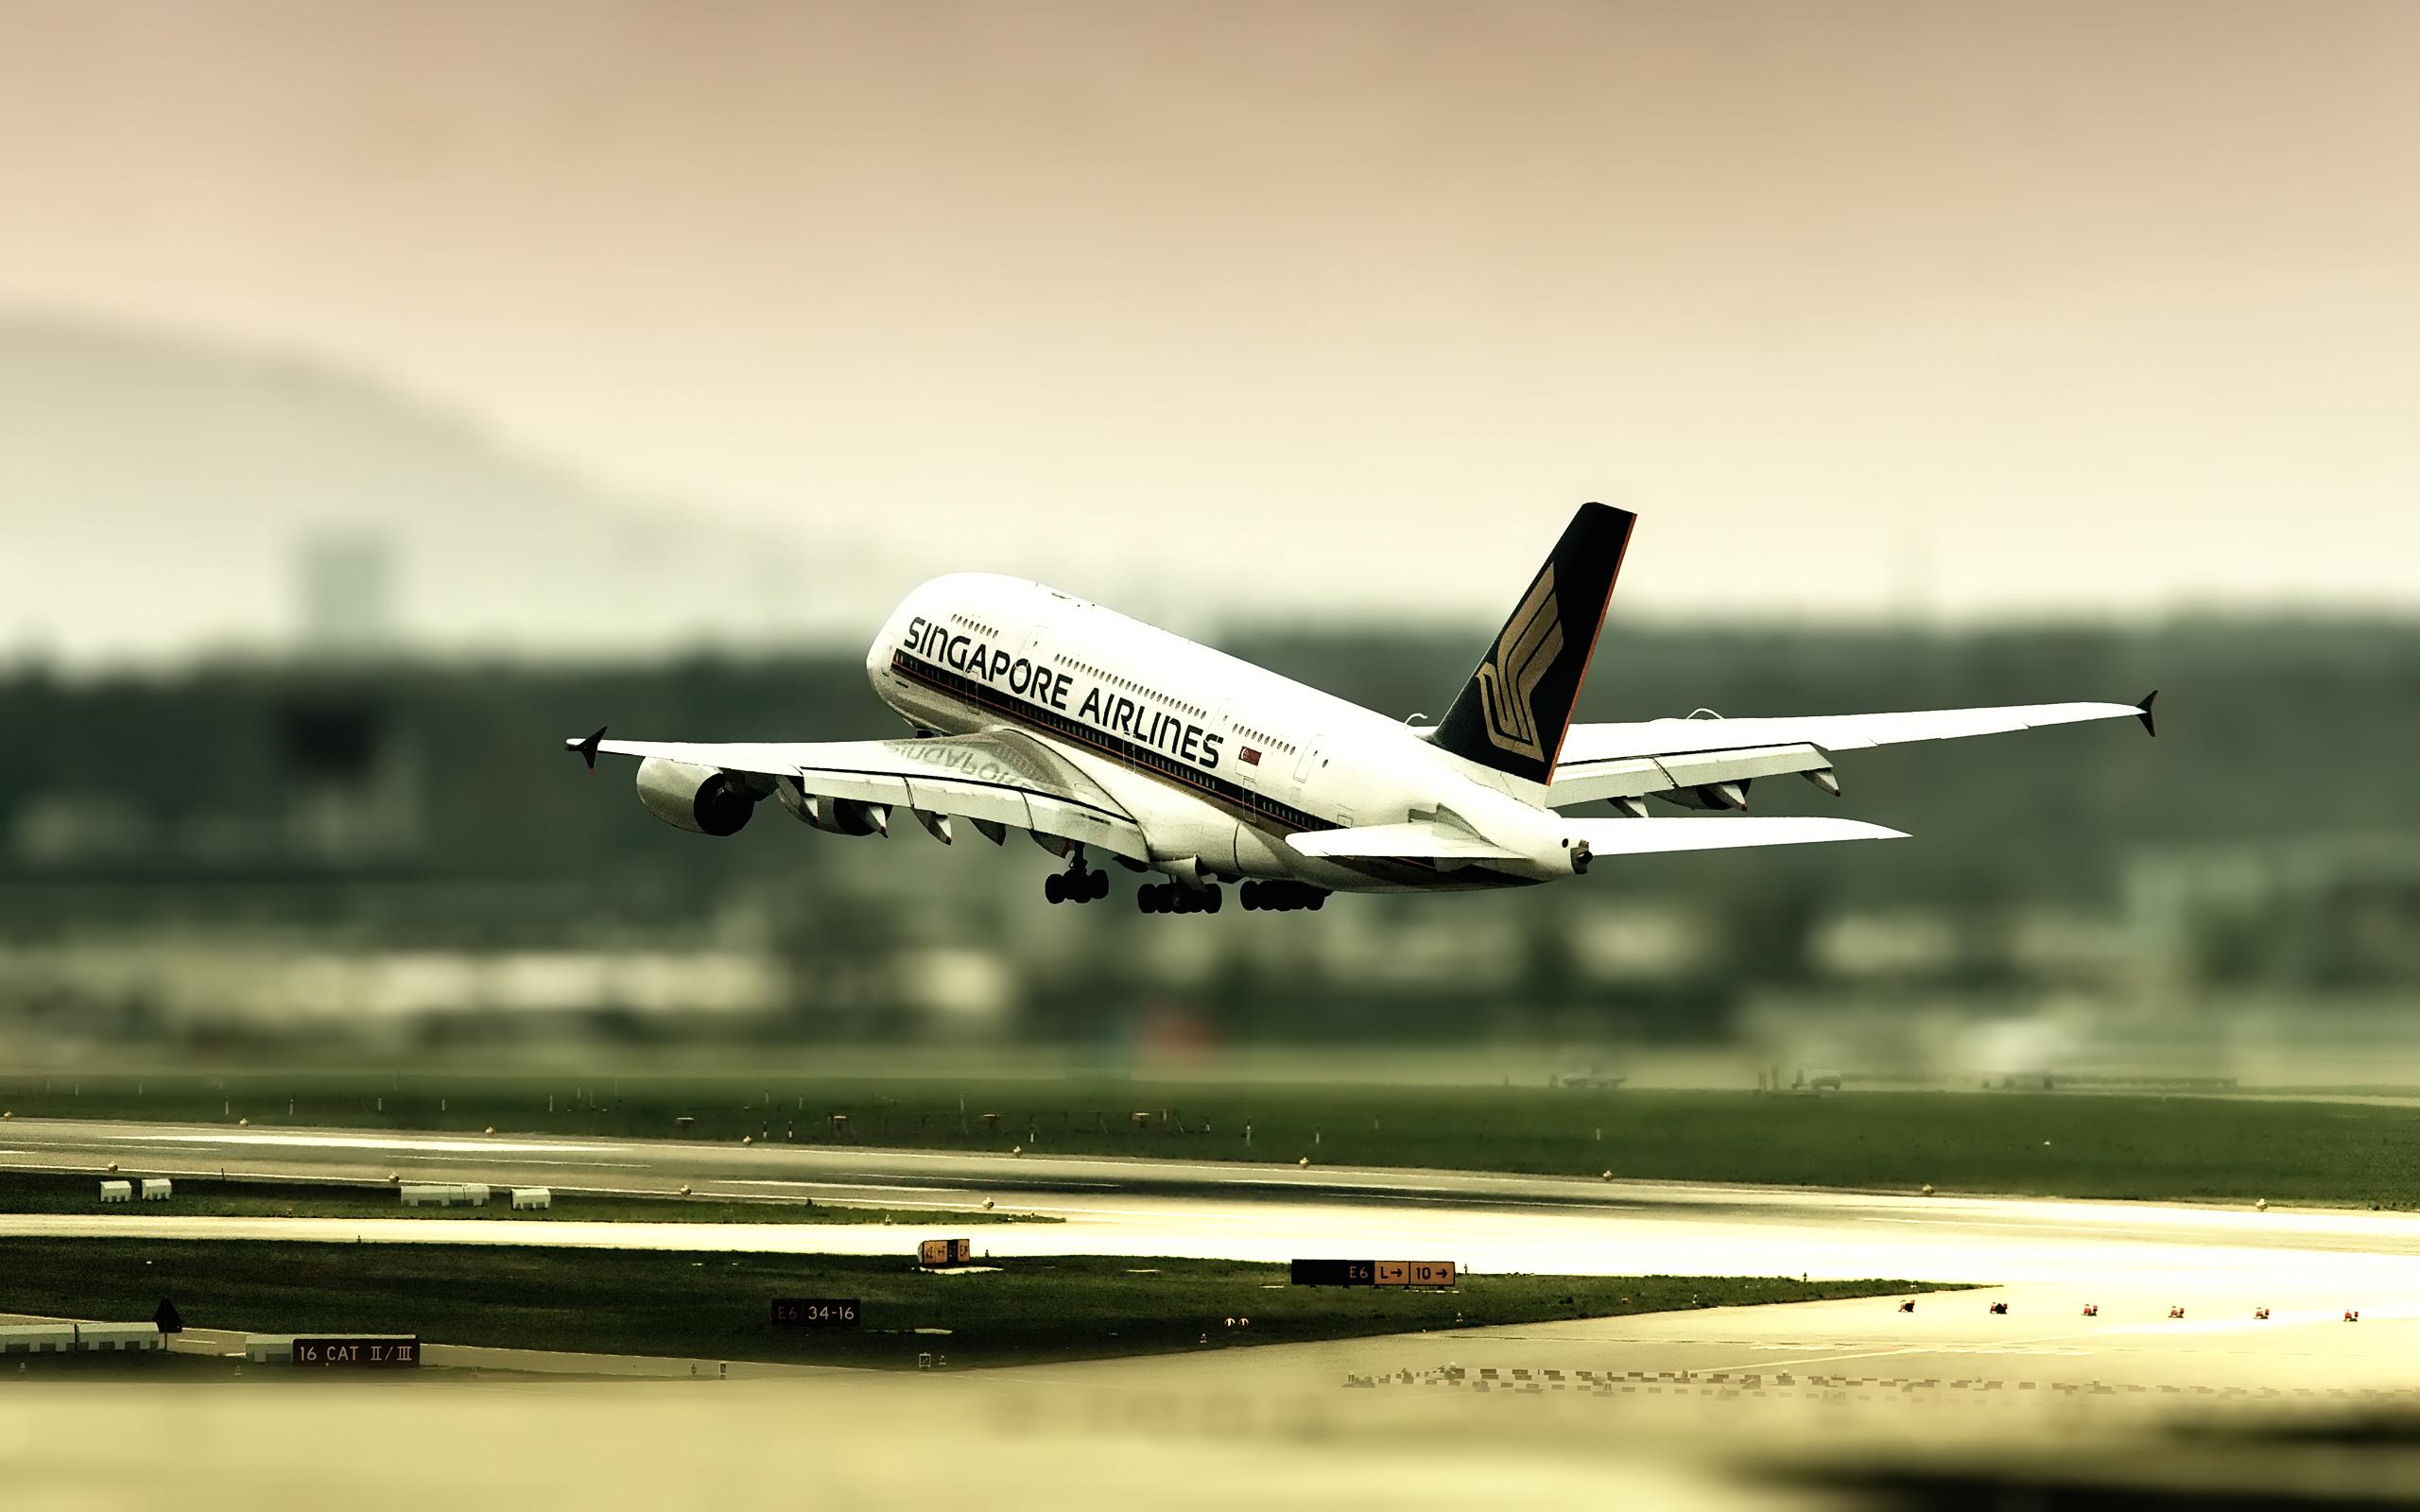 General 2560x1600 airplane tilt shift passenger aircraft A380 Airbus aircraft vehicle Singapore photo manipulation